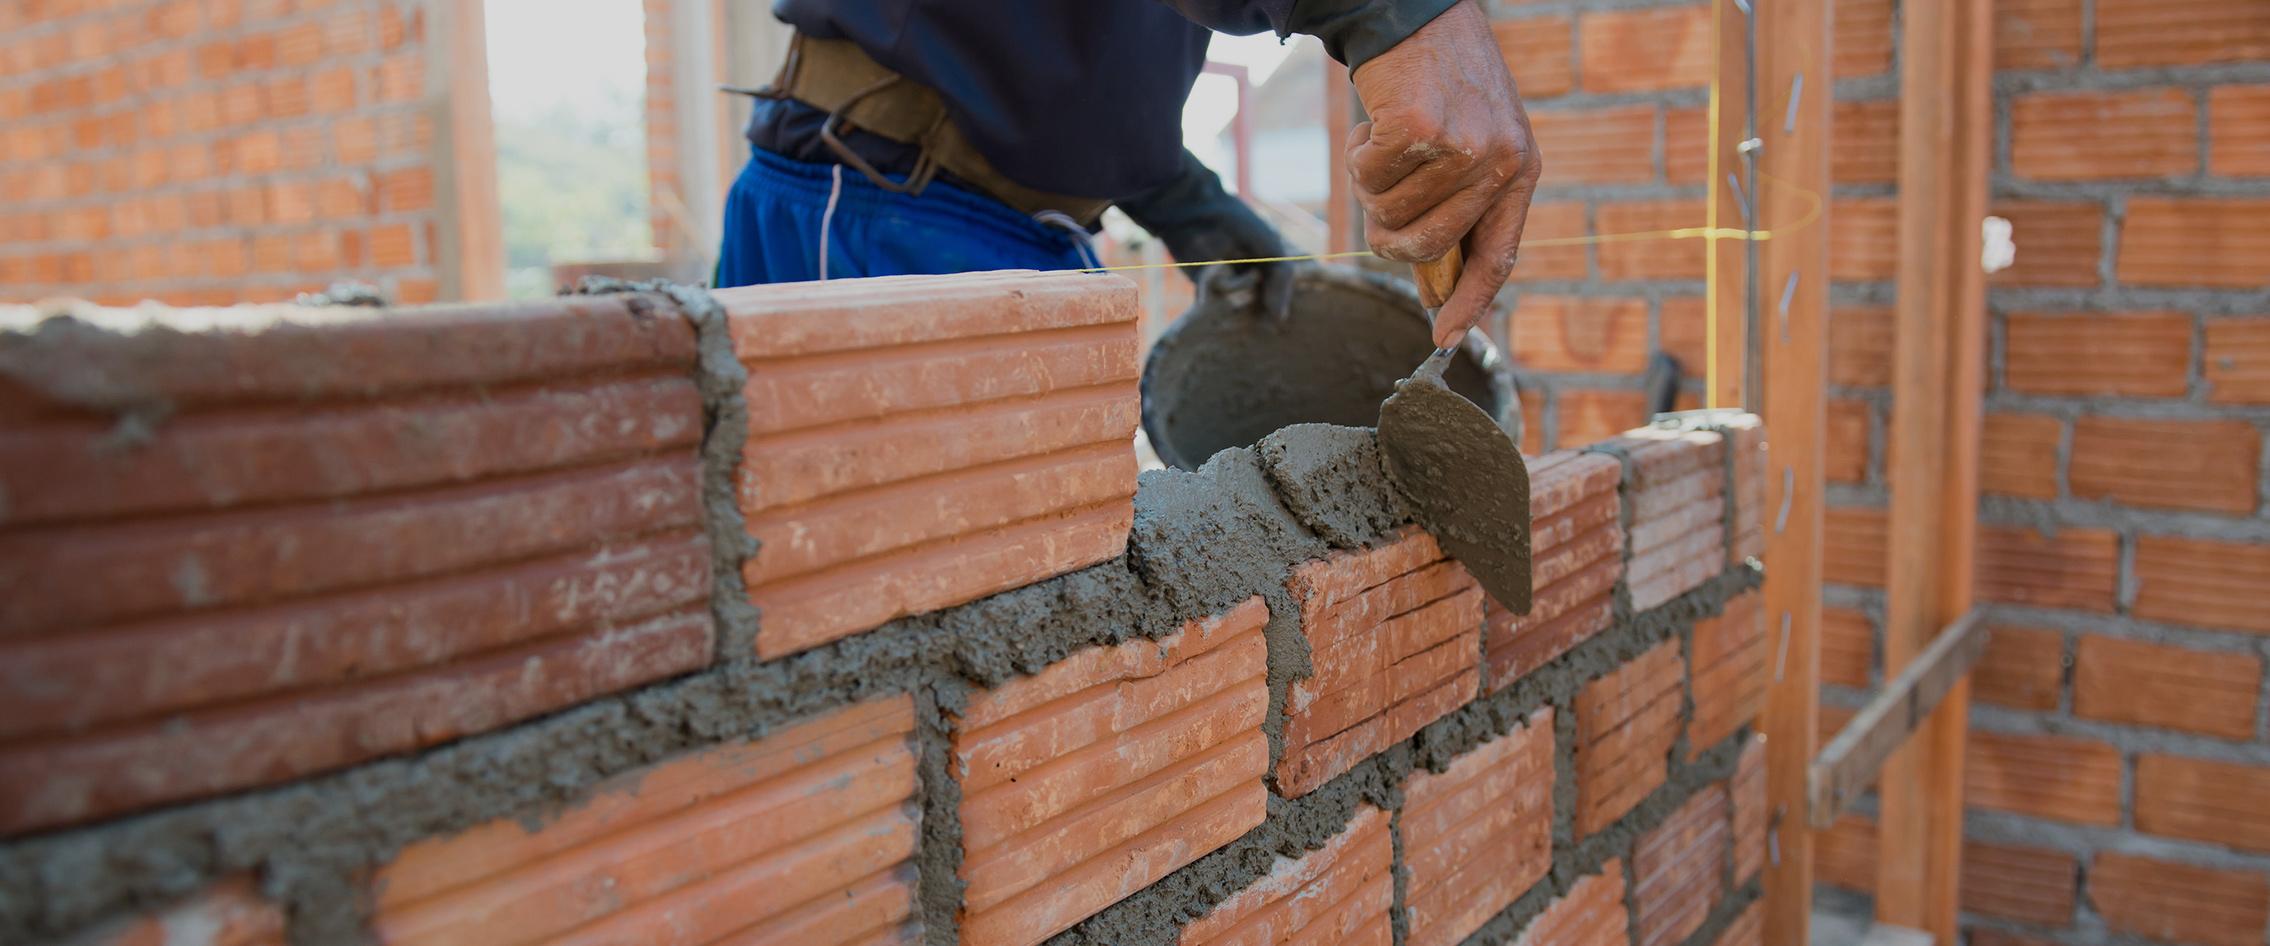 Concrete Contractor Masonry Demolition Company Angier Nc